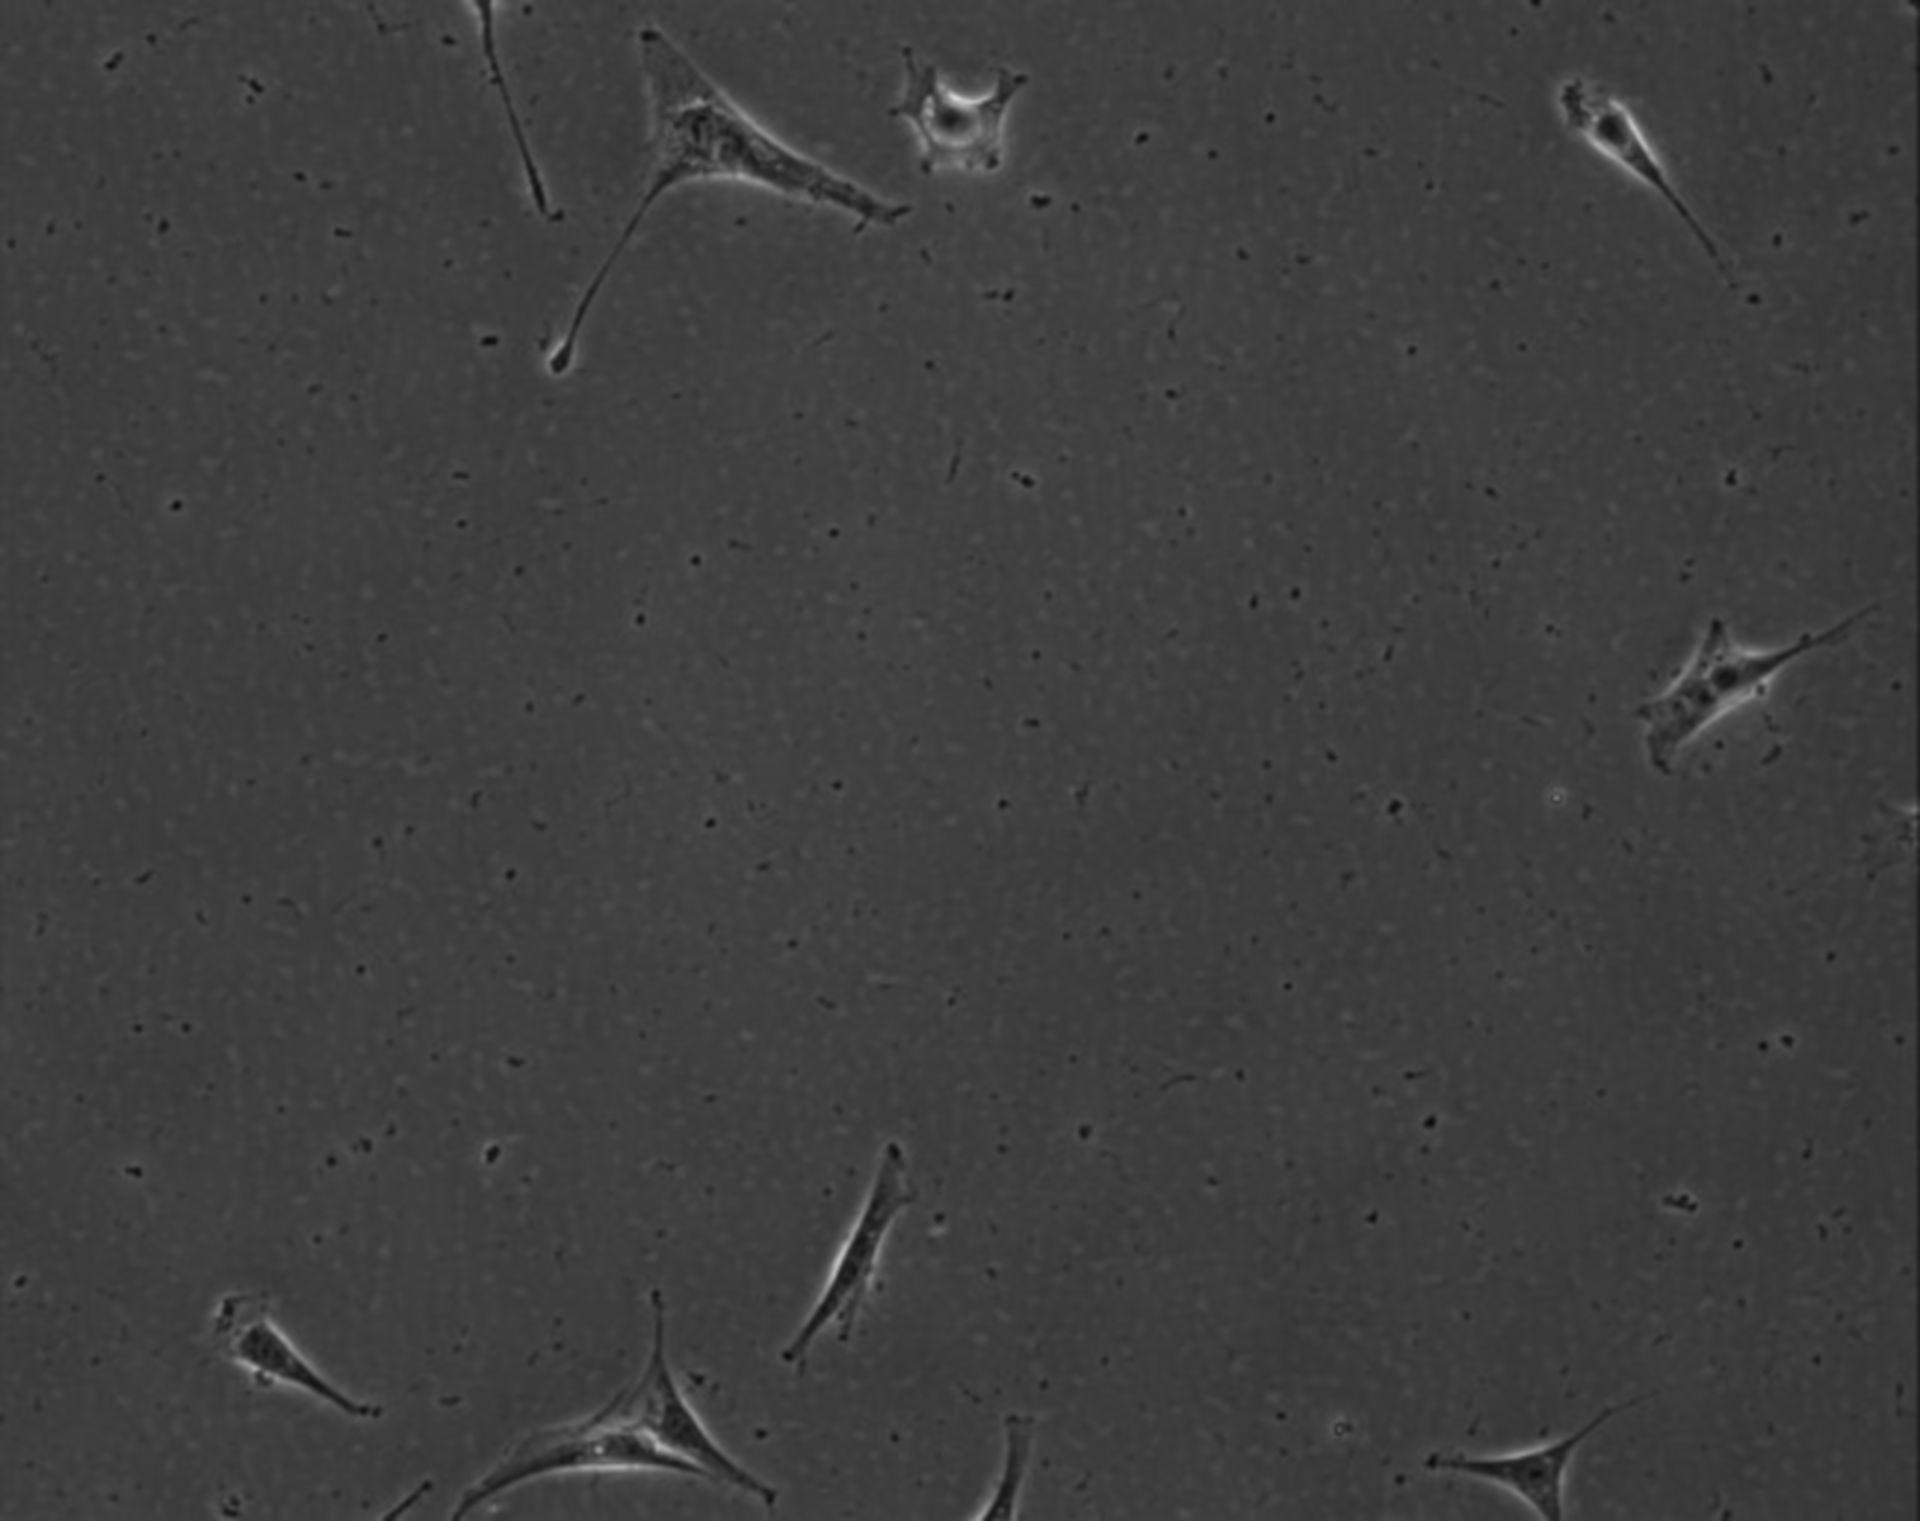 Mus musculus (Extracellular matrix part) - CIL:8982